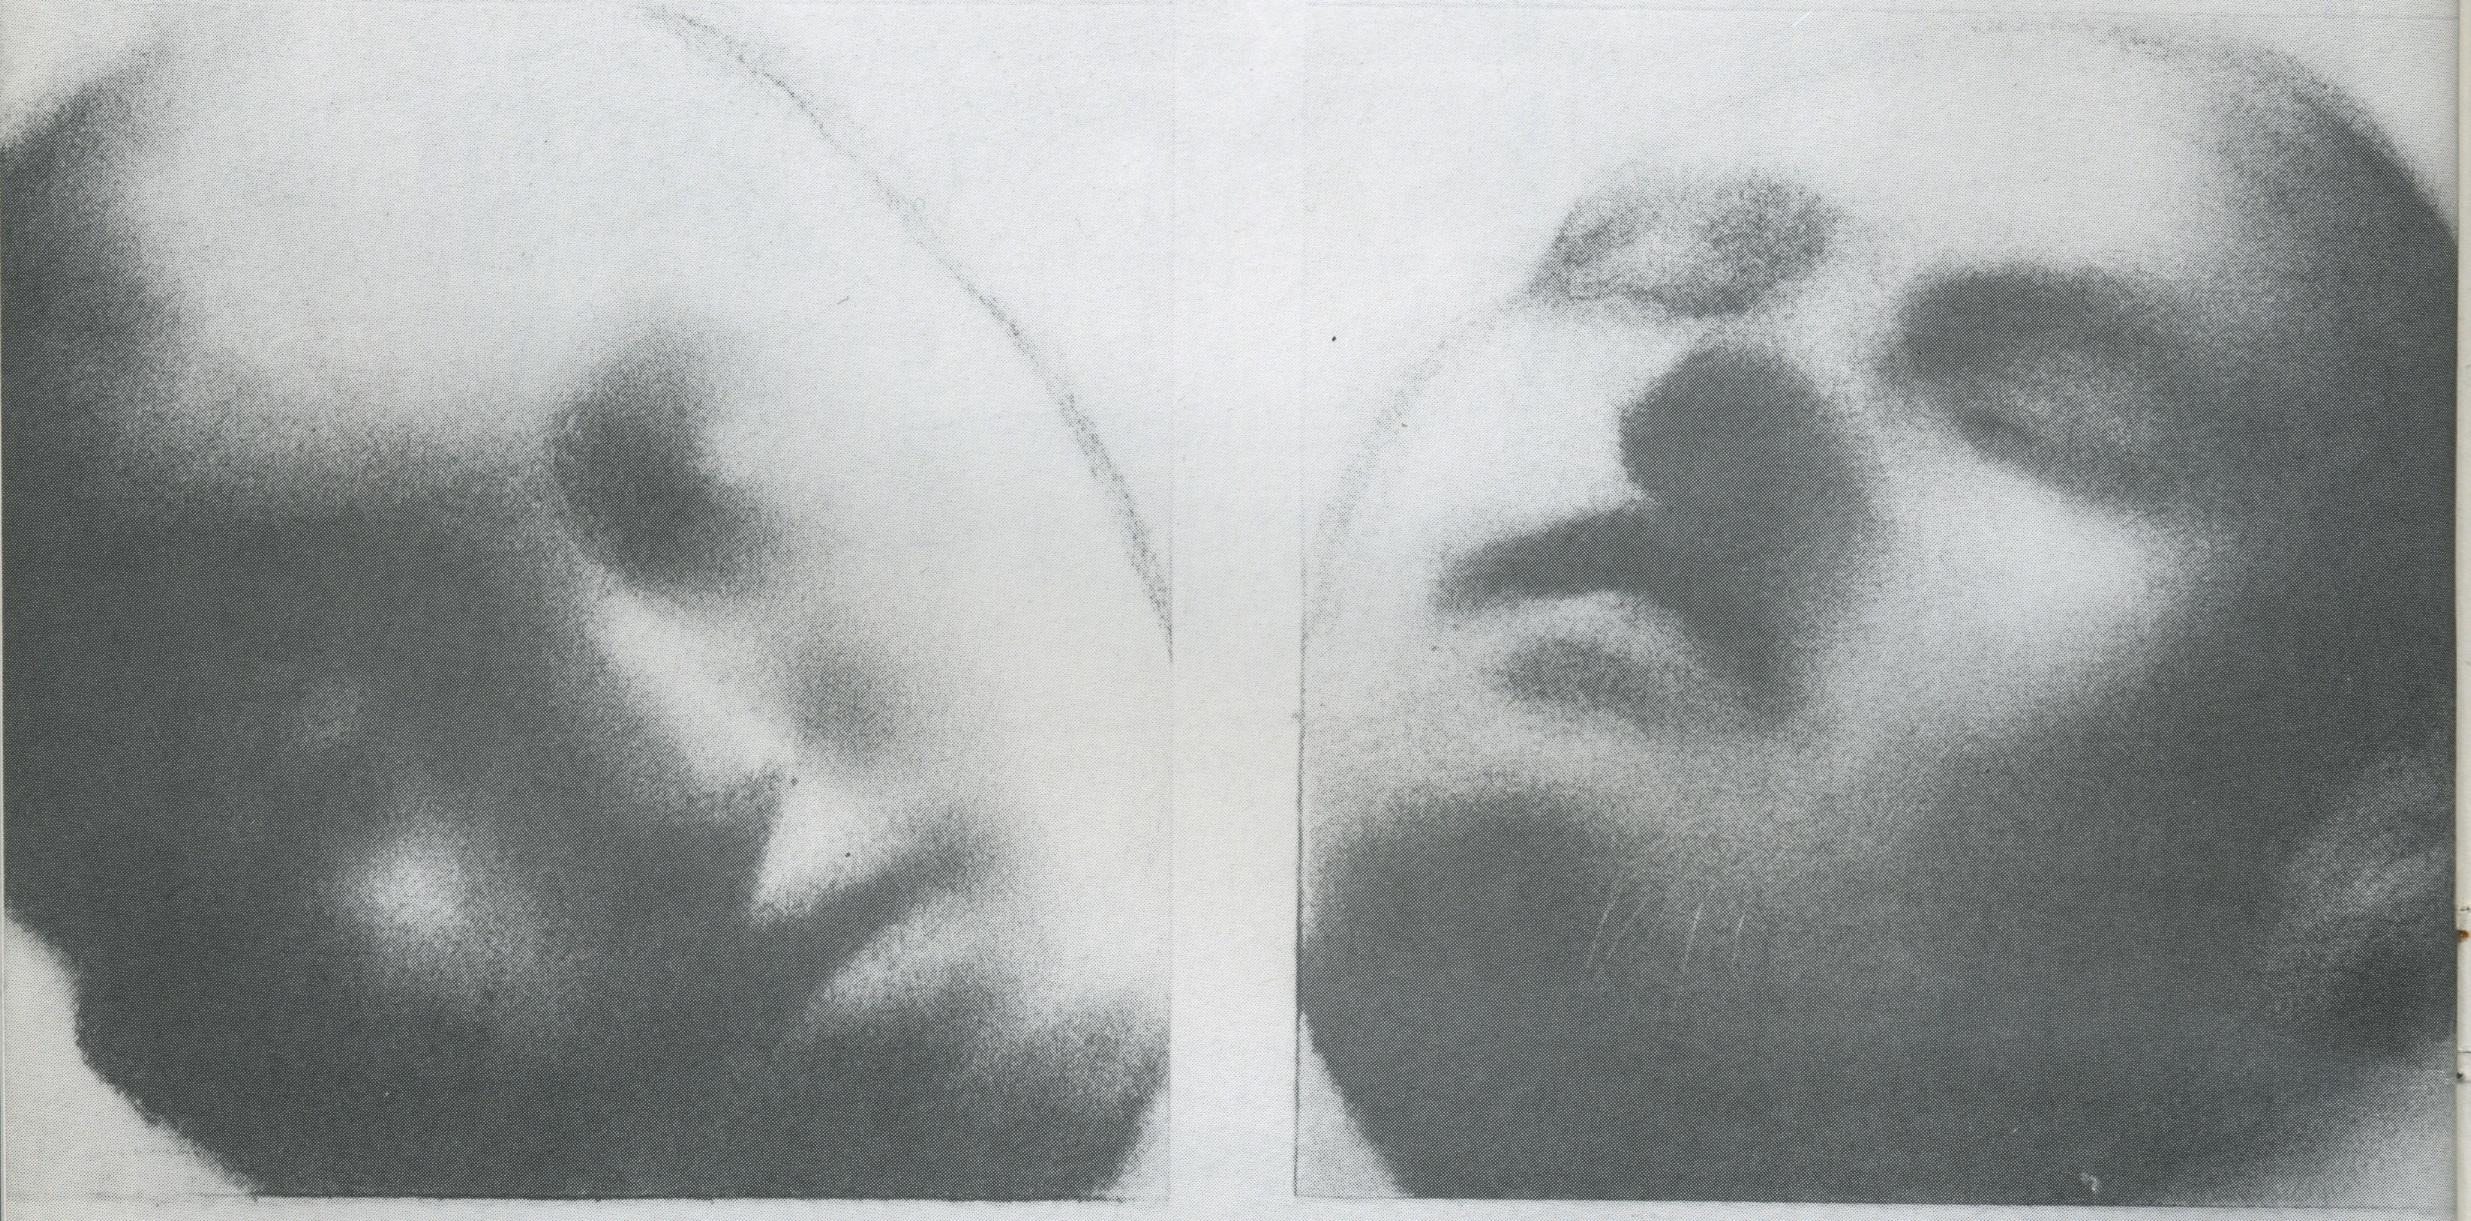 Stefania Fabrizi_Dormiveglia_gessetto su carta_35x25cm_1991_hi